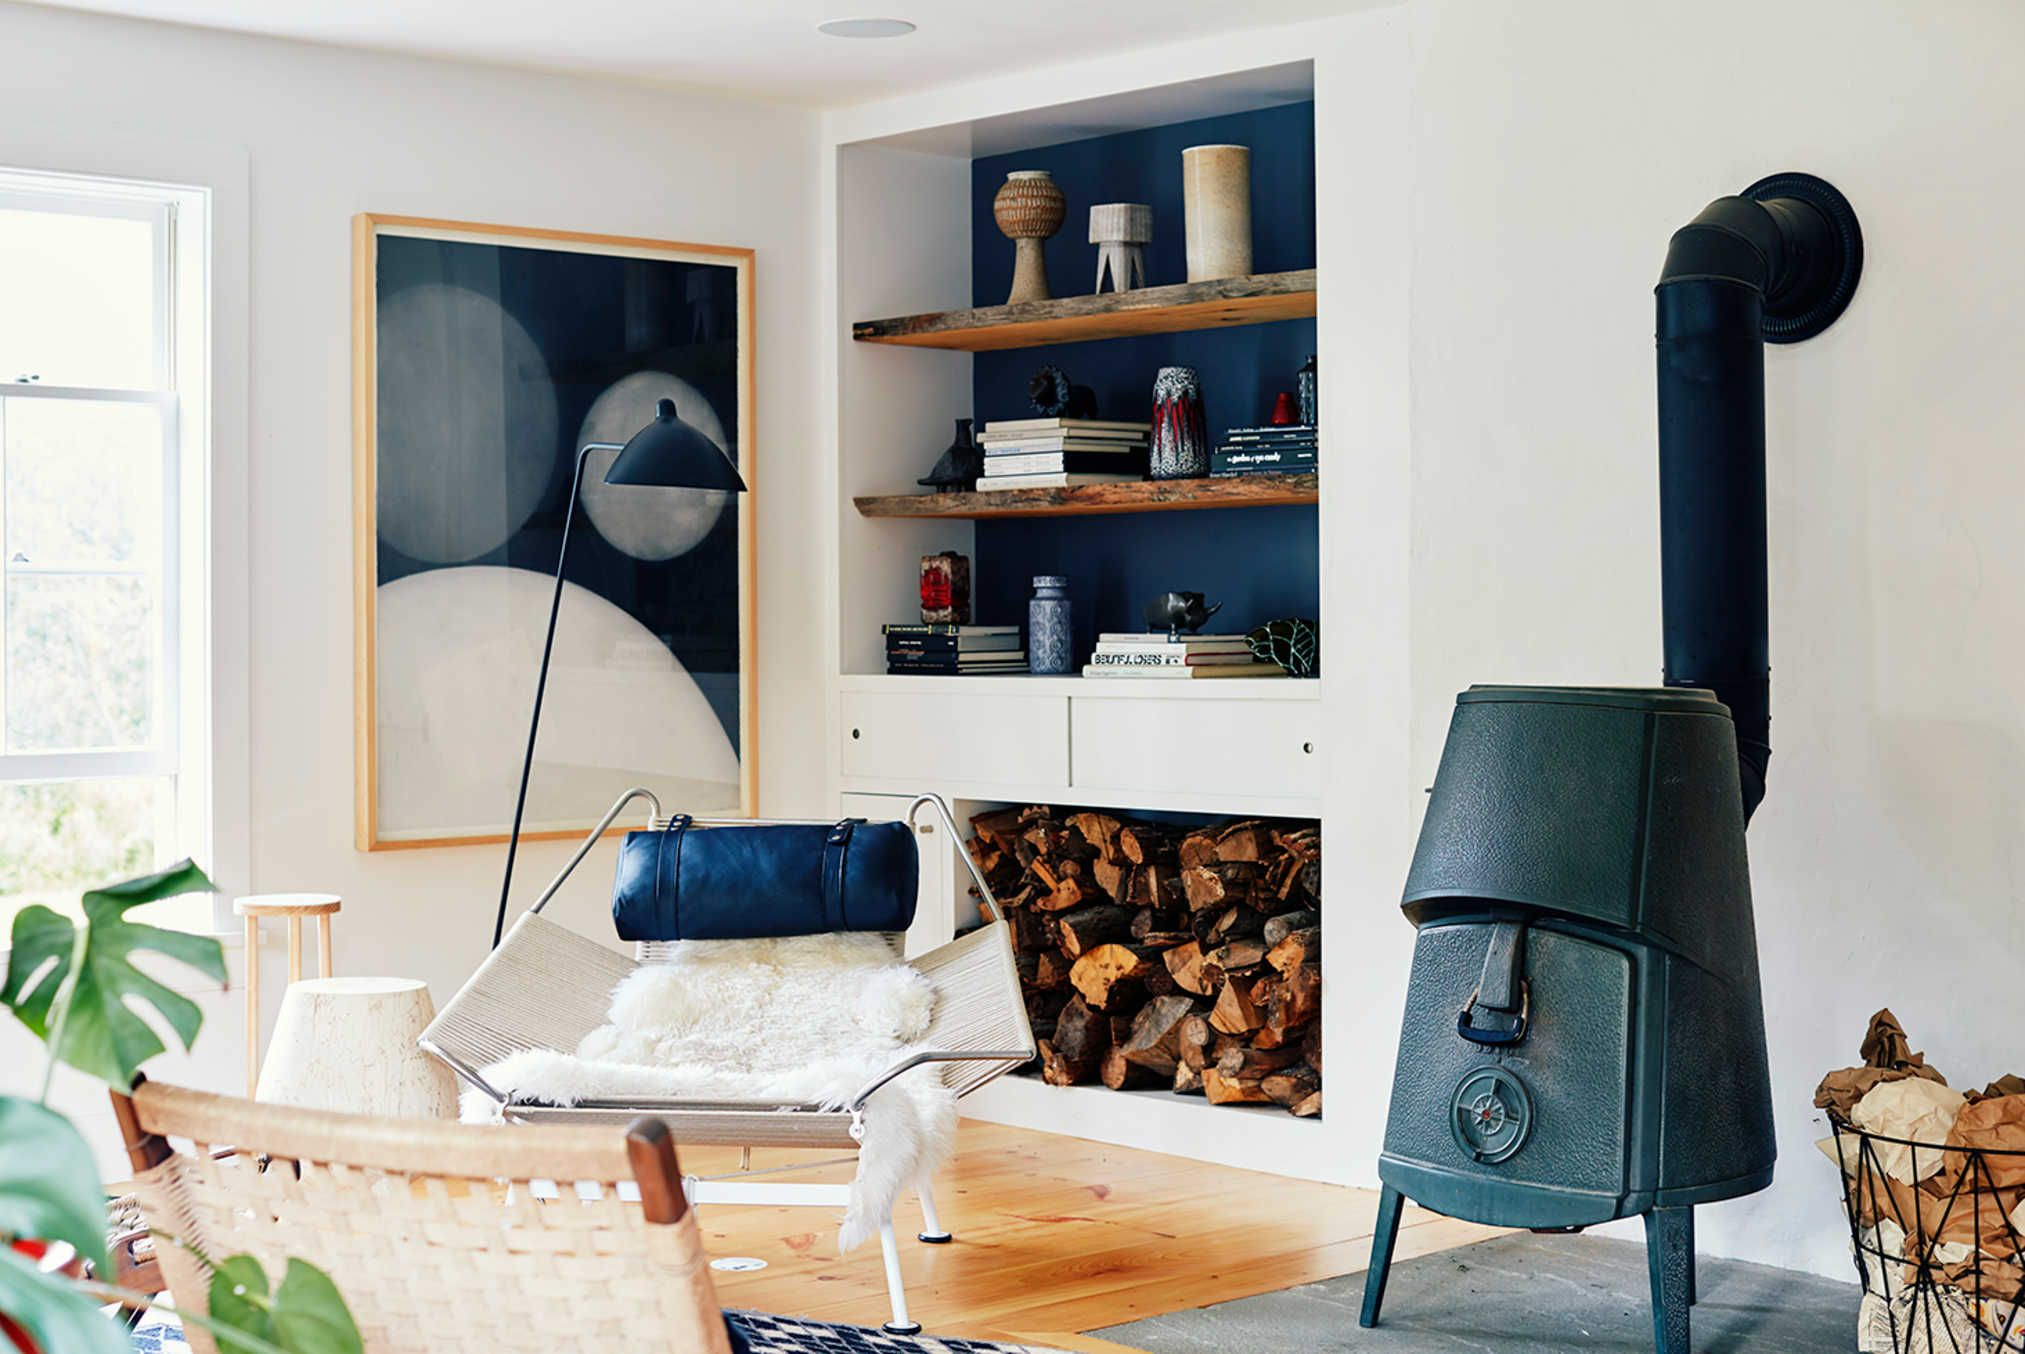 50 Examples Of Beautiful Scandinavian Interior Design.